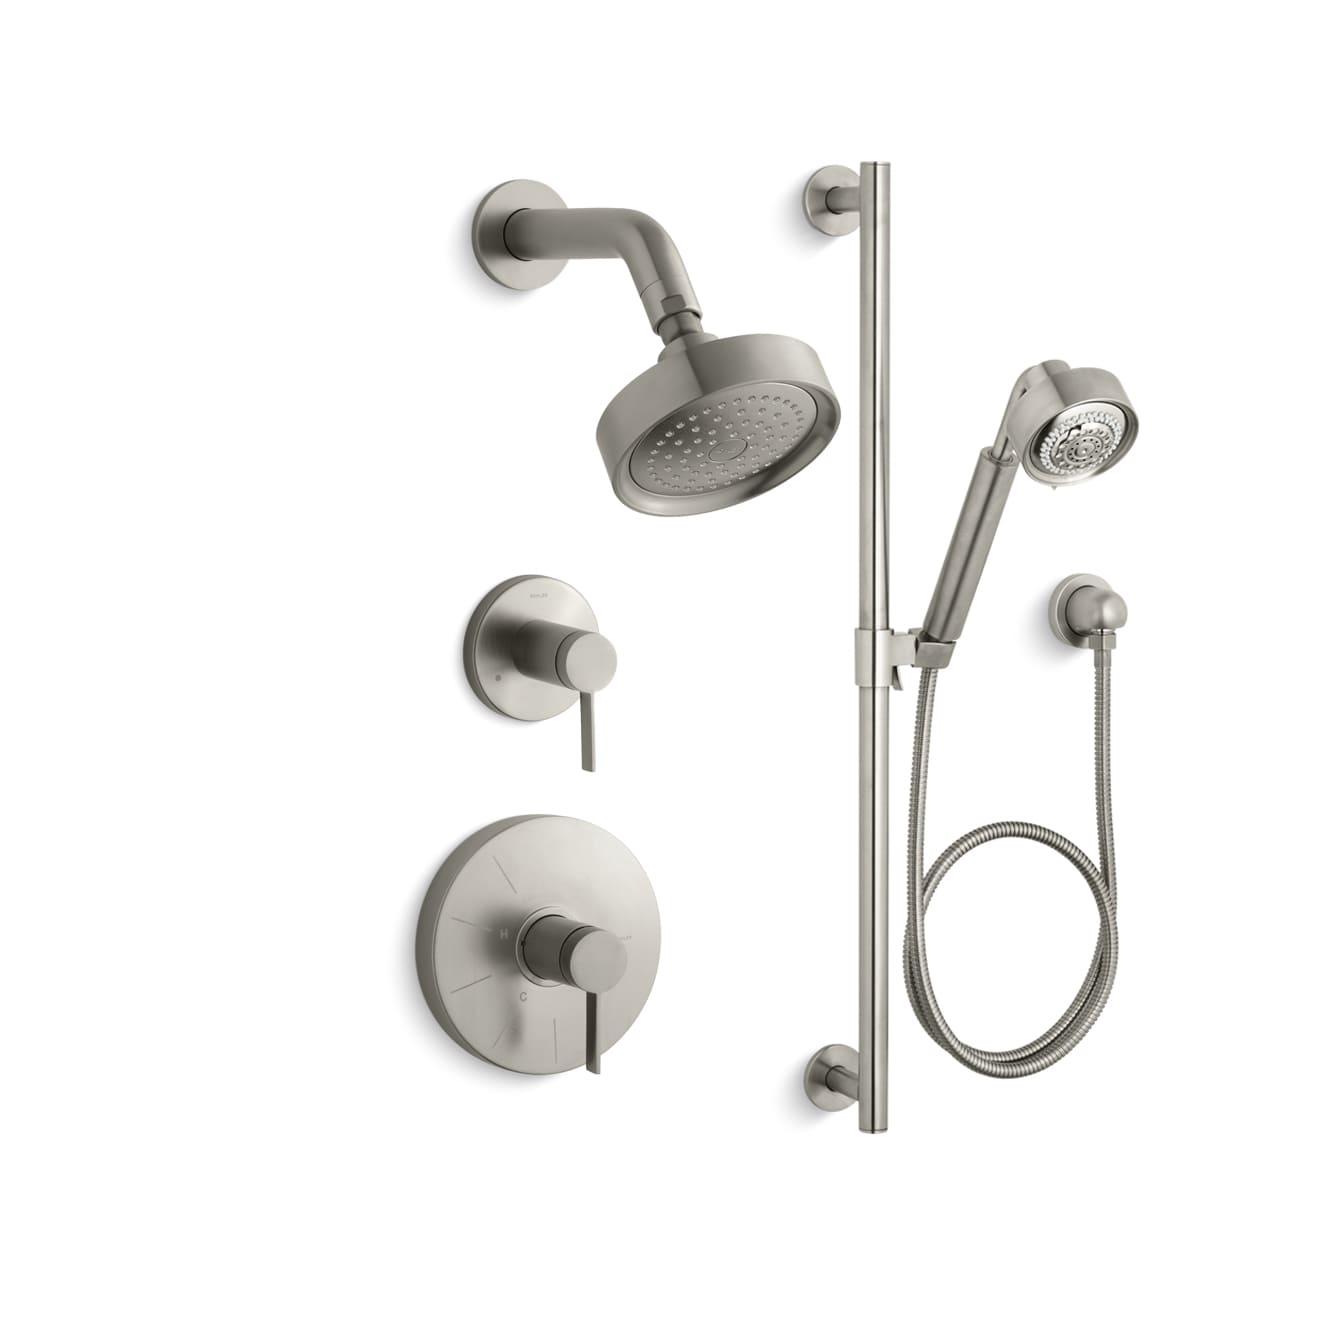 kohler polished chrome stillness ritetemp pressure balanced shower system with shower head and hand shower faucetcom